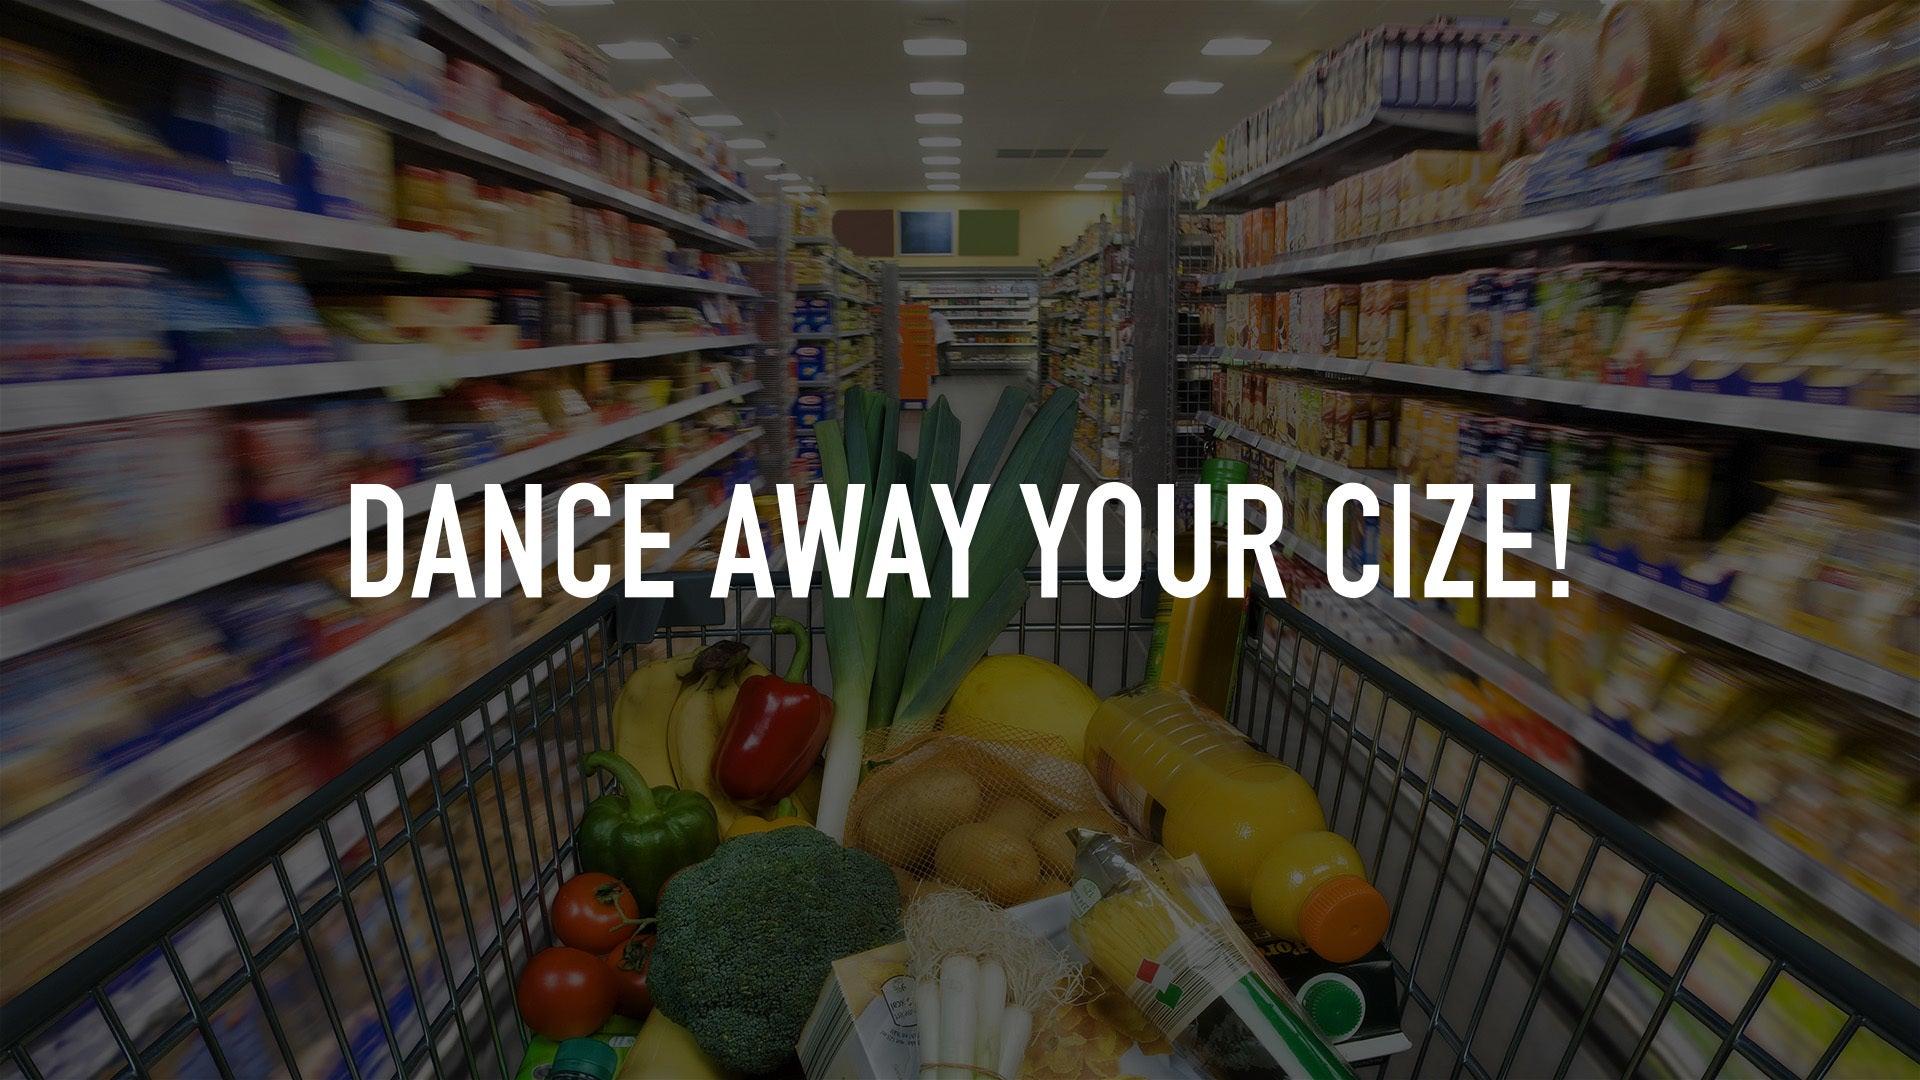 Dance Away Your Cize!